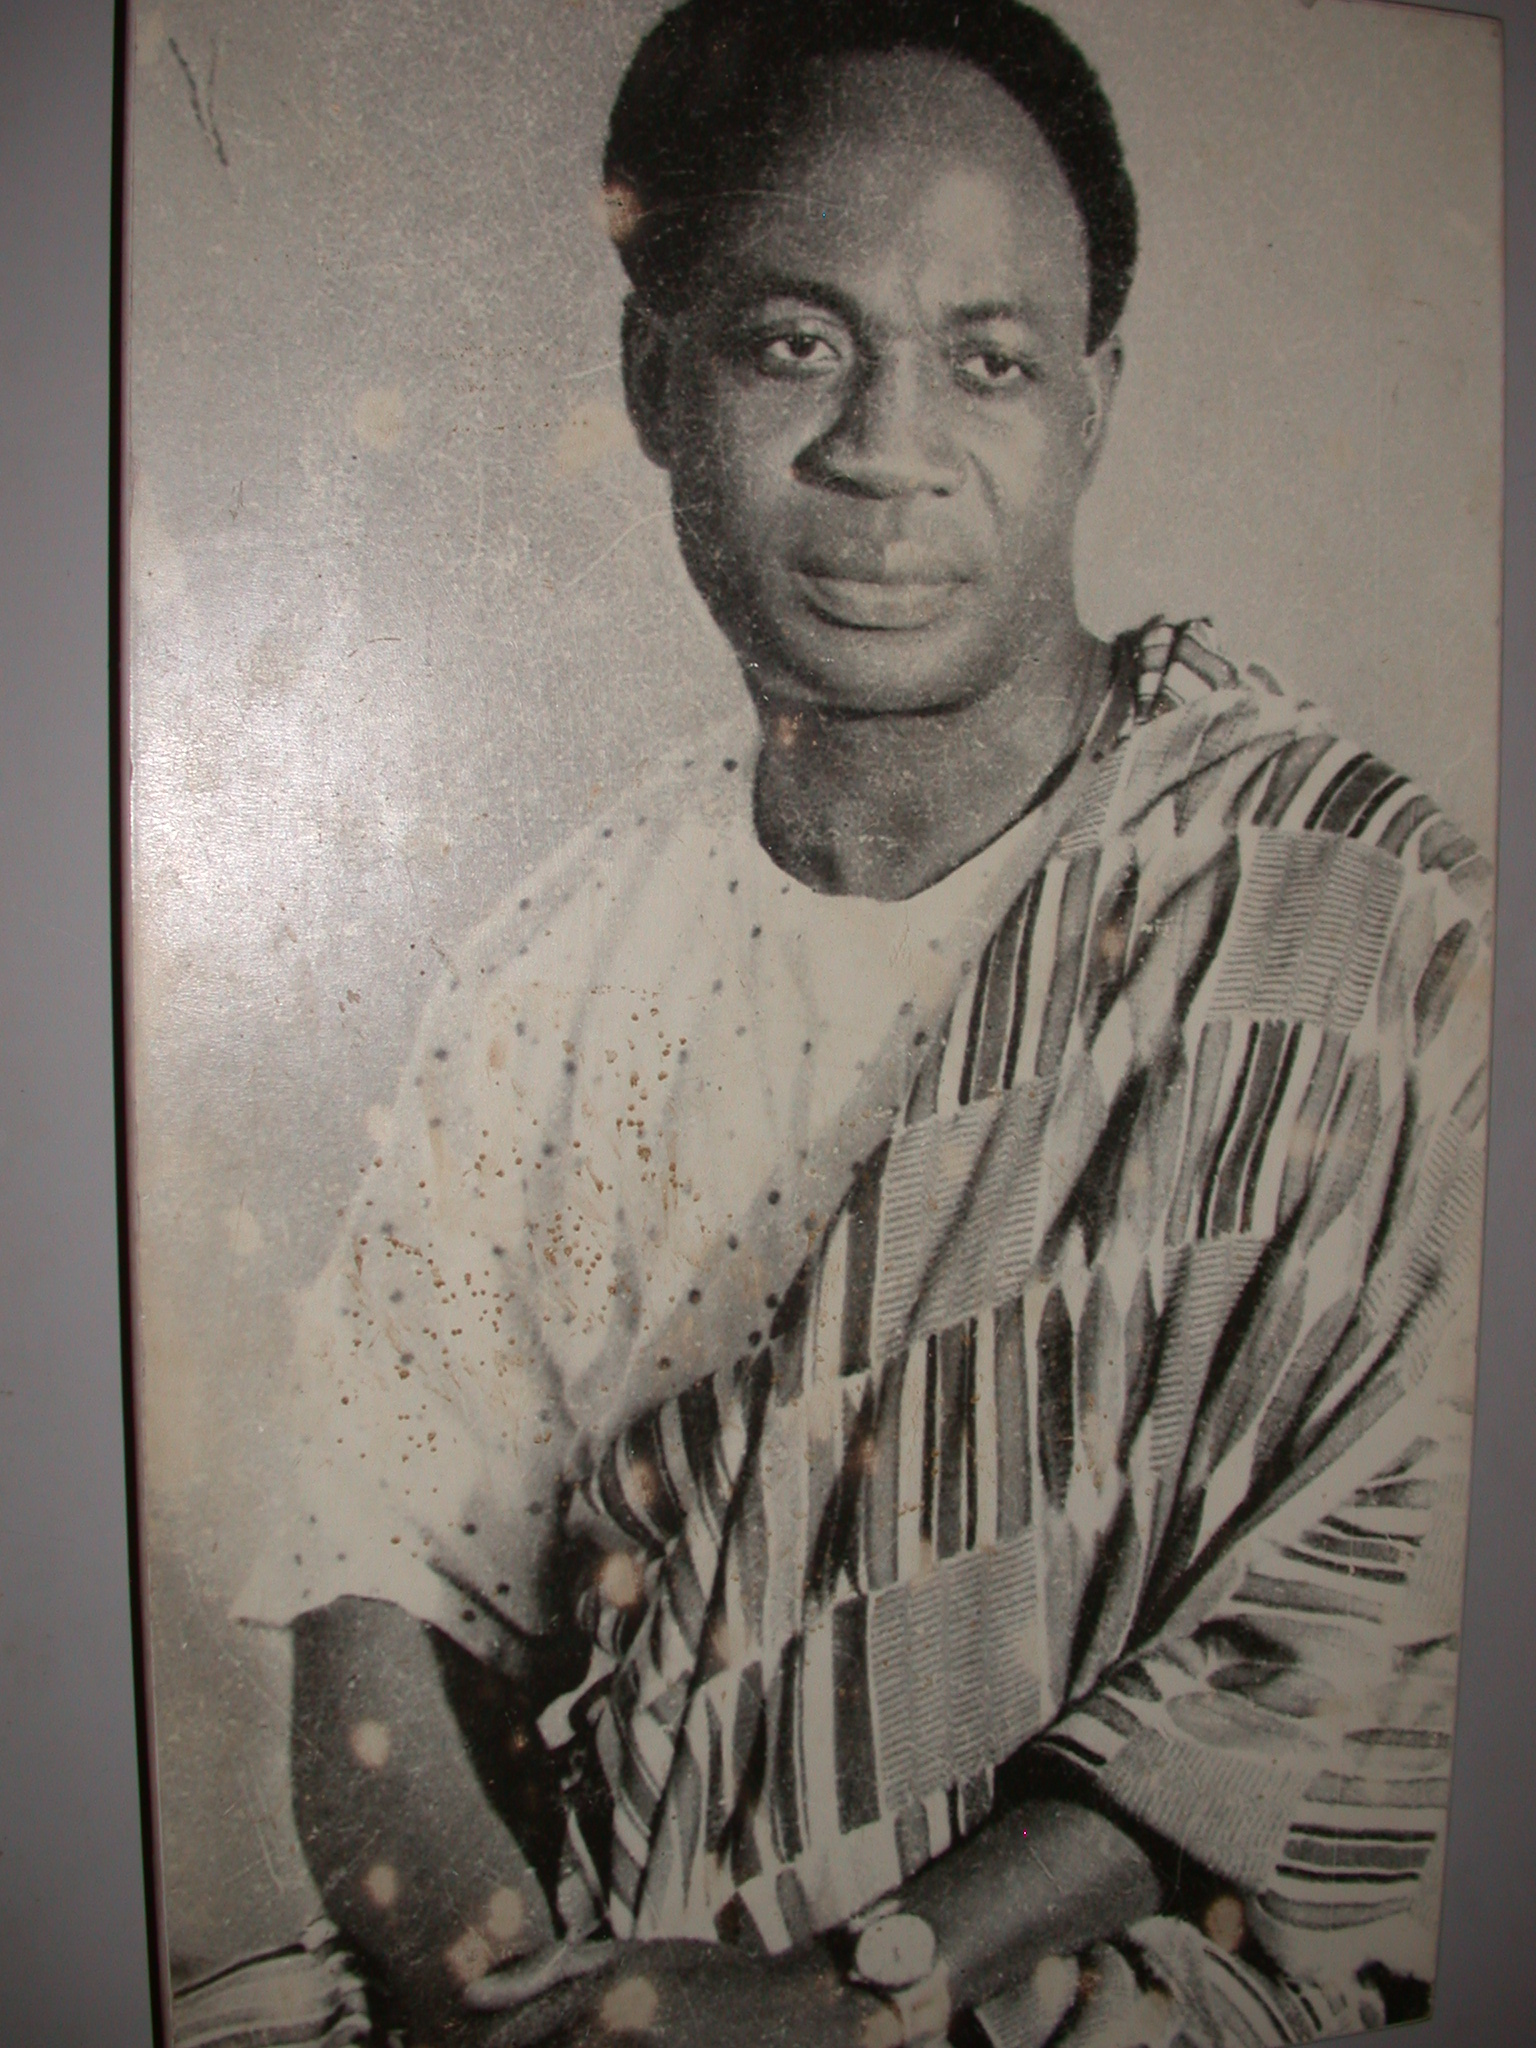 Photograph of Kwame Nkrumah, Cape Coast Slave Fort Museum, Cape Coast, Ghana